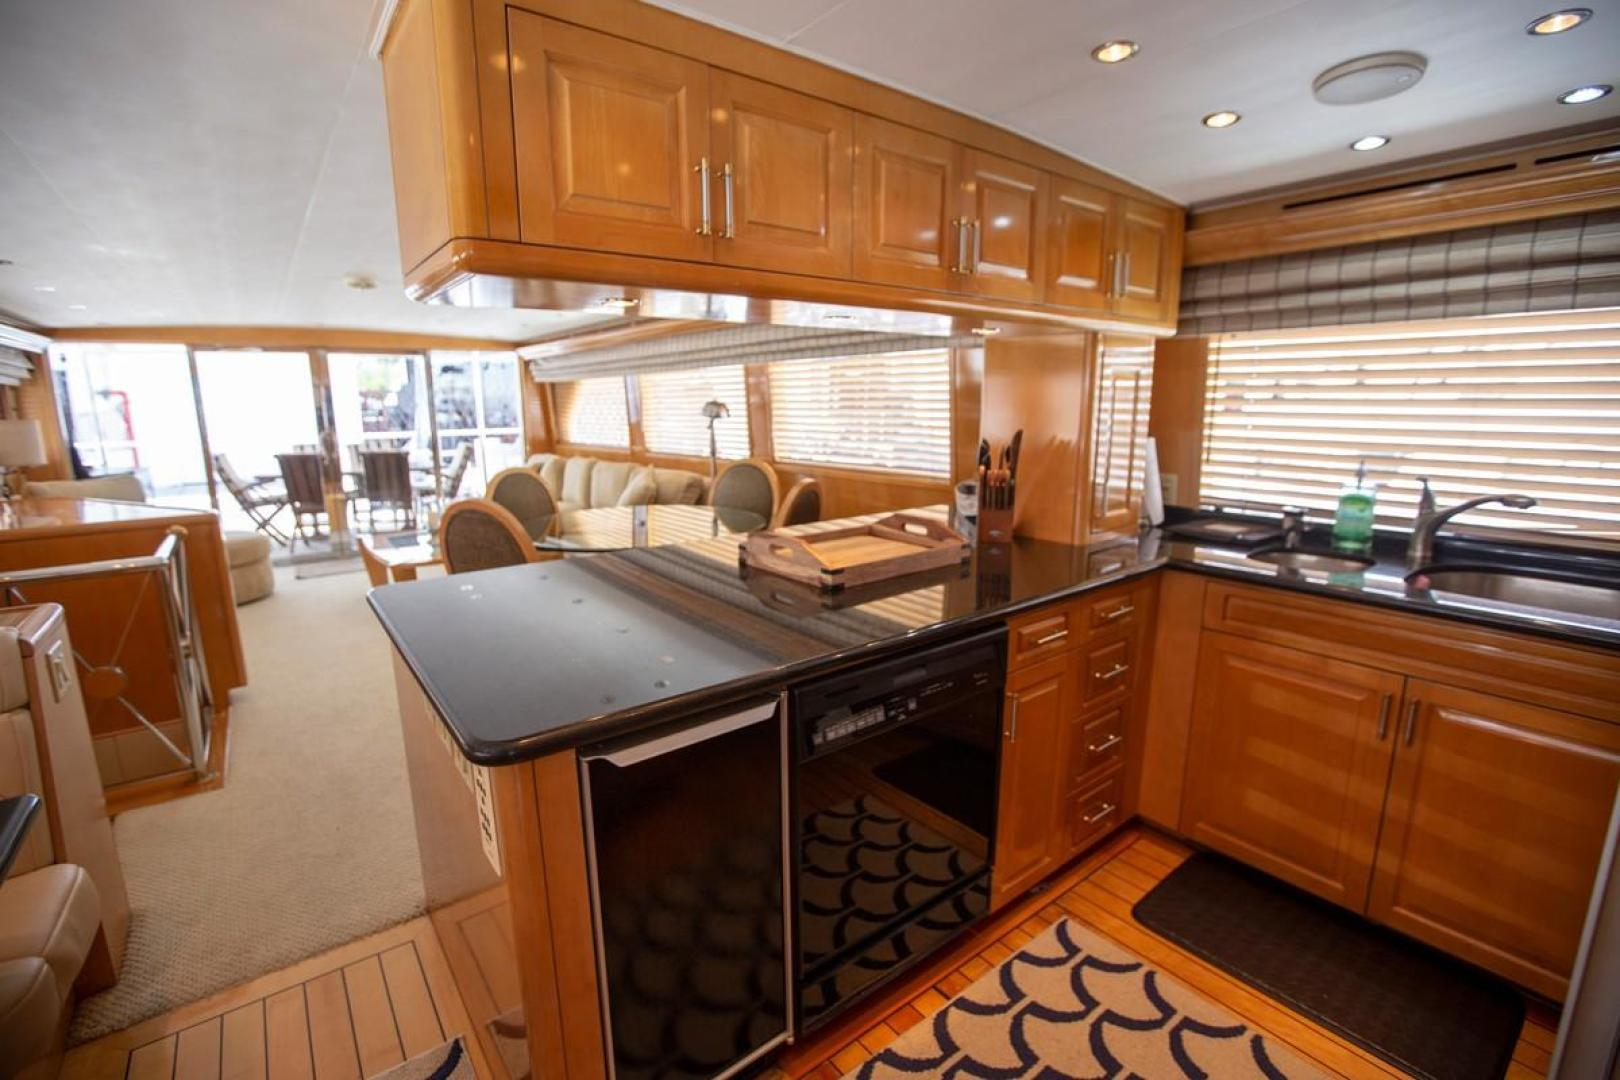 Hatteras-Cockpit Motor Yacht 2000-Getaway Ft. Lauderdale-Florida-United States-977370 | Thumbnail